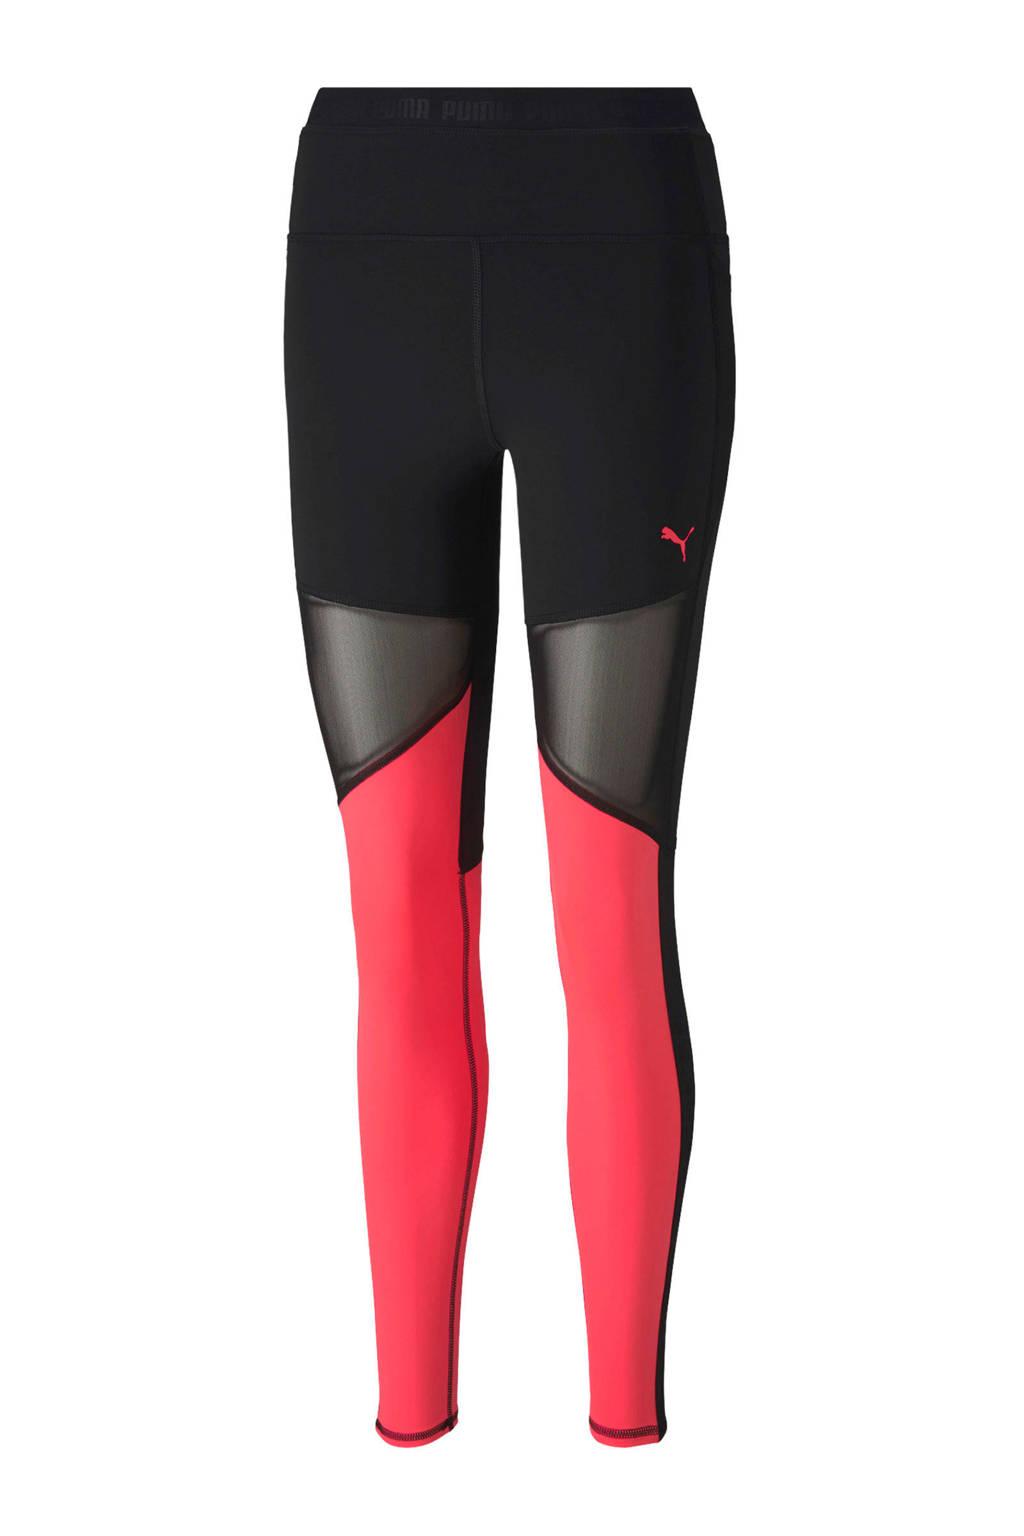 Puma sportbroek zwart/roze, Zwart/roze